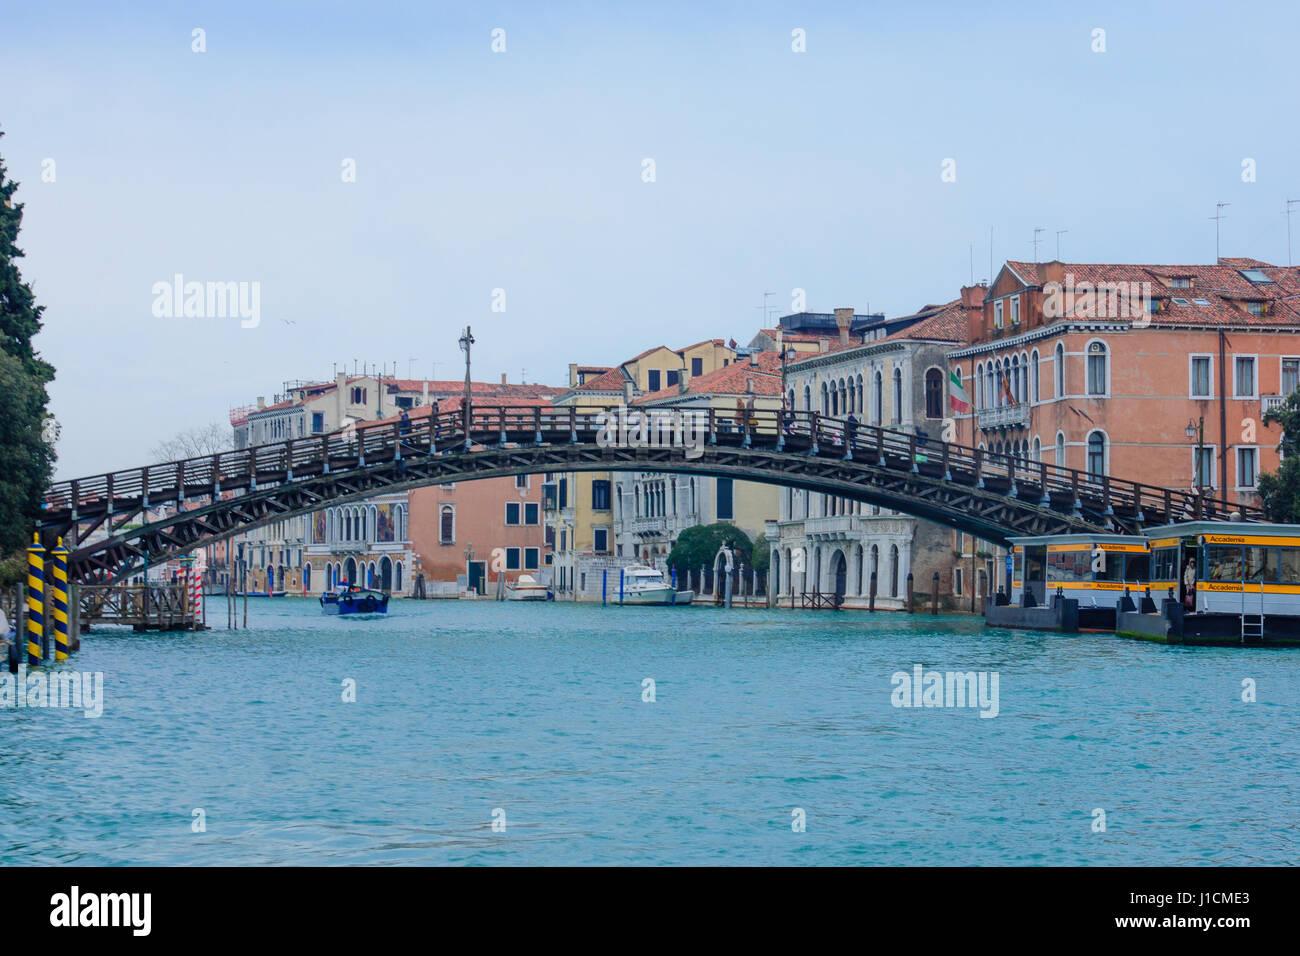 The Academia Bridge, in Venice, Veneto, Italy Stock Photo